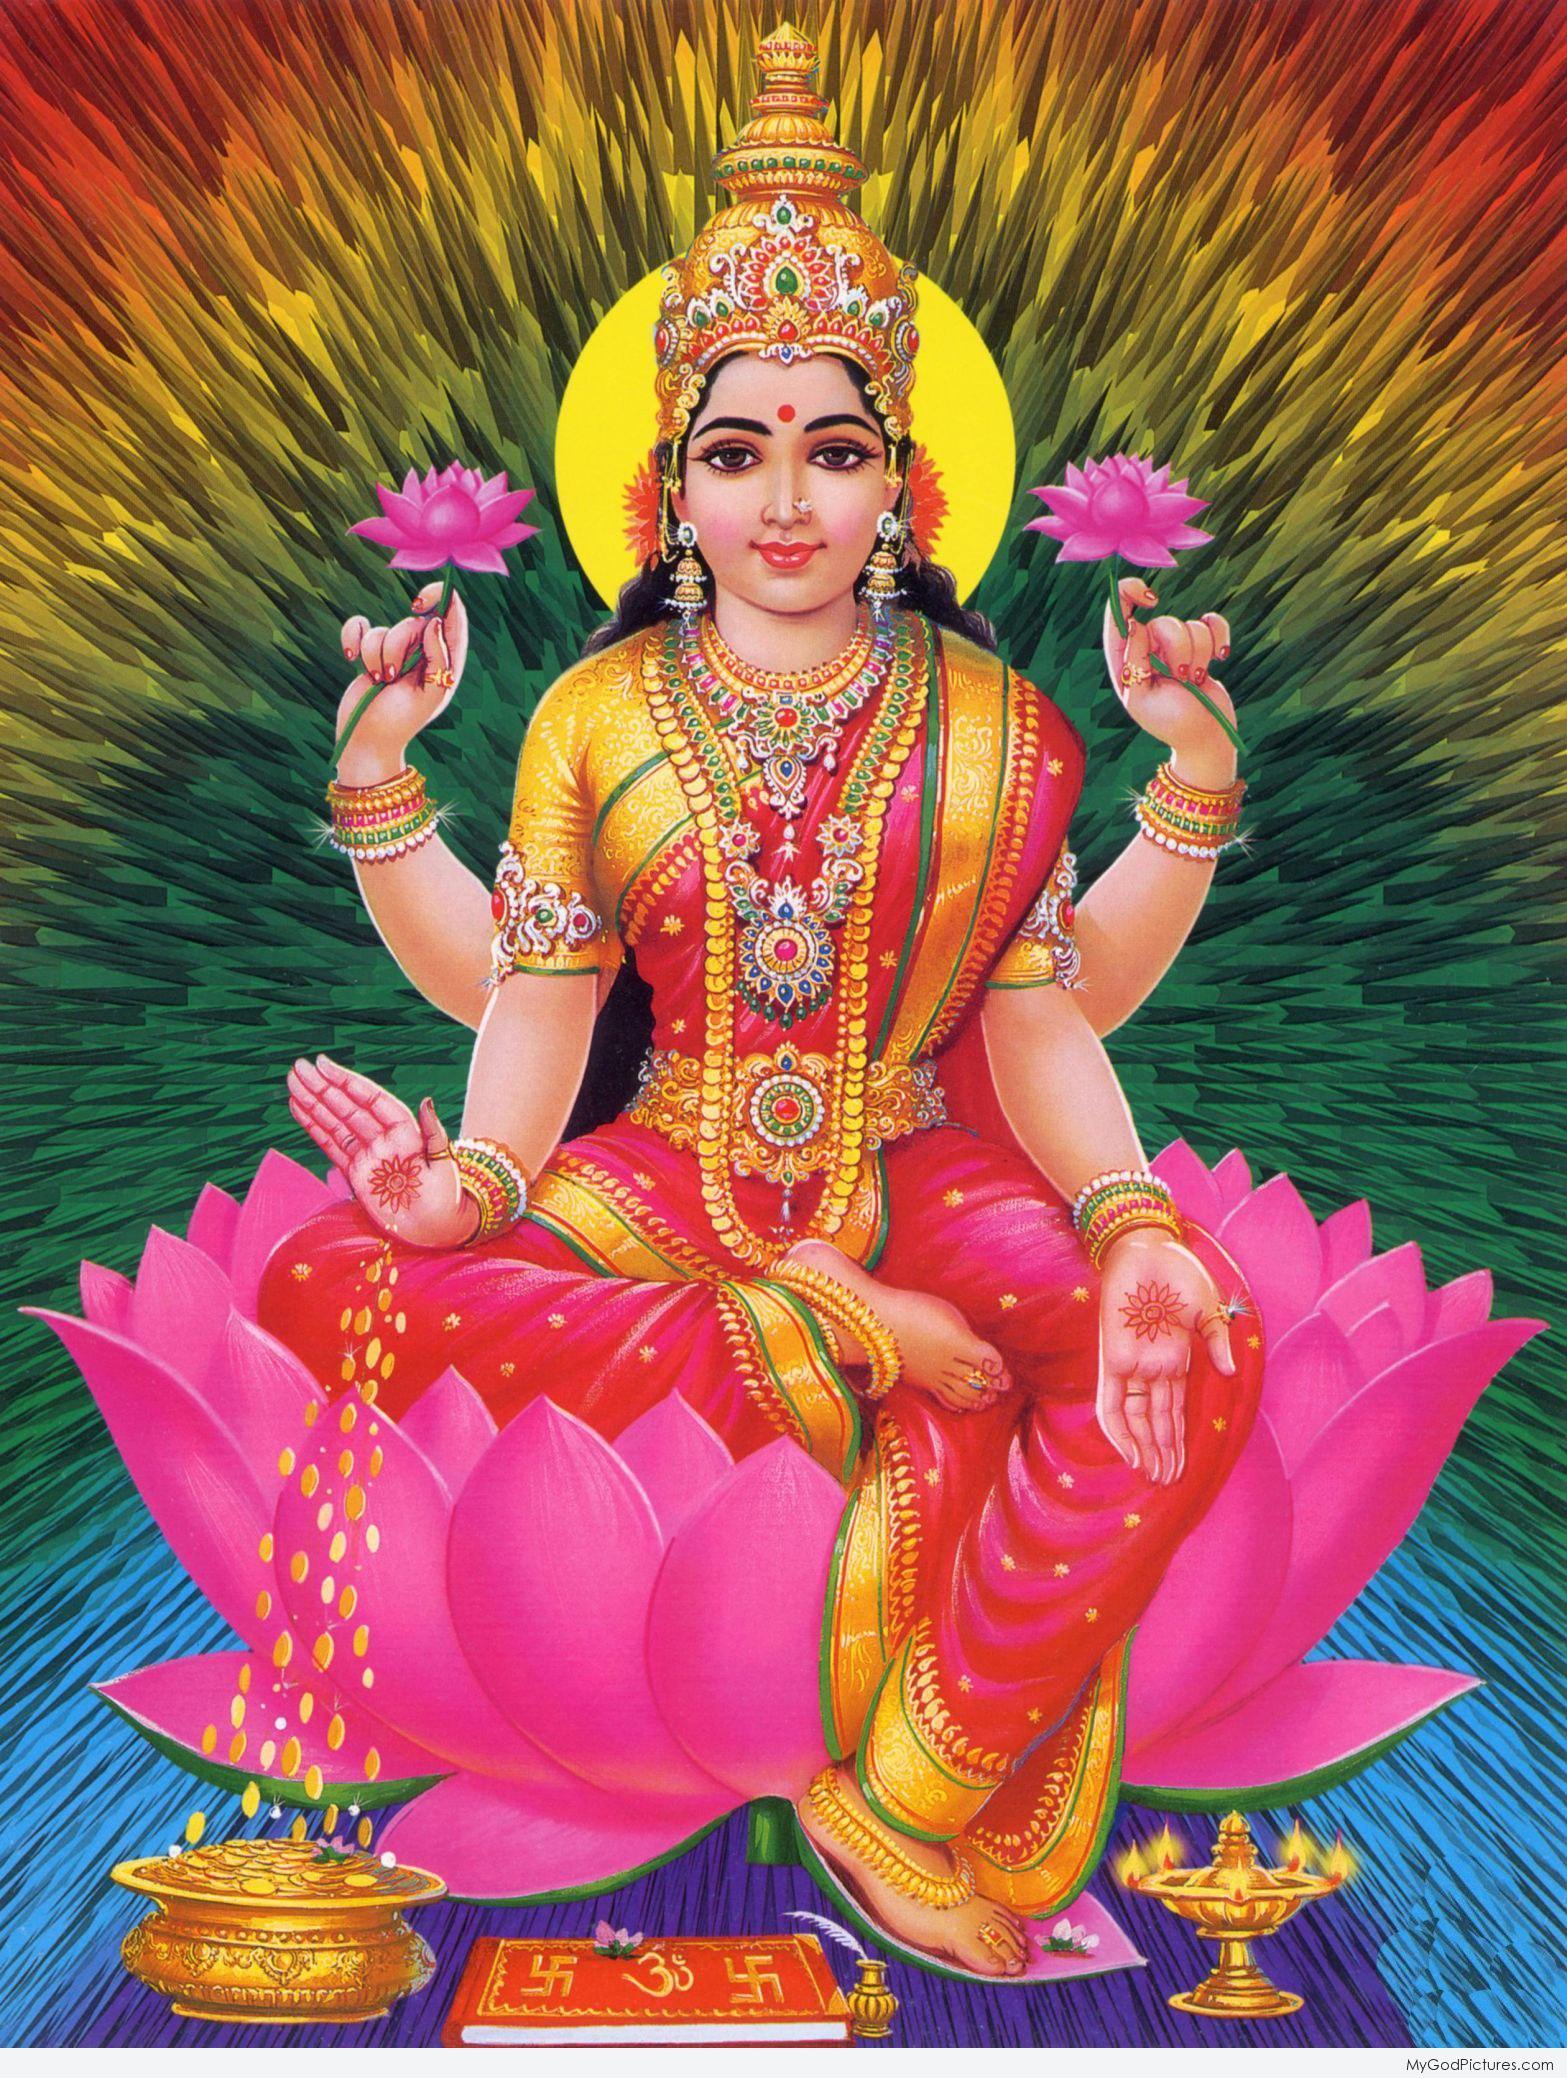 Hindu goddess mata lakshmi ji god pictures - Images of hindu gods and goddesses ...